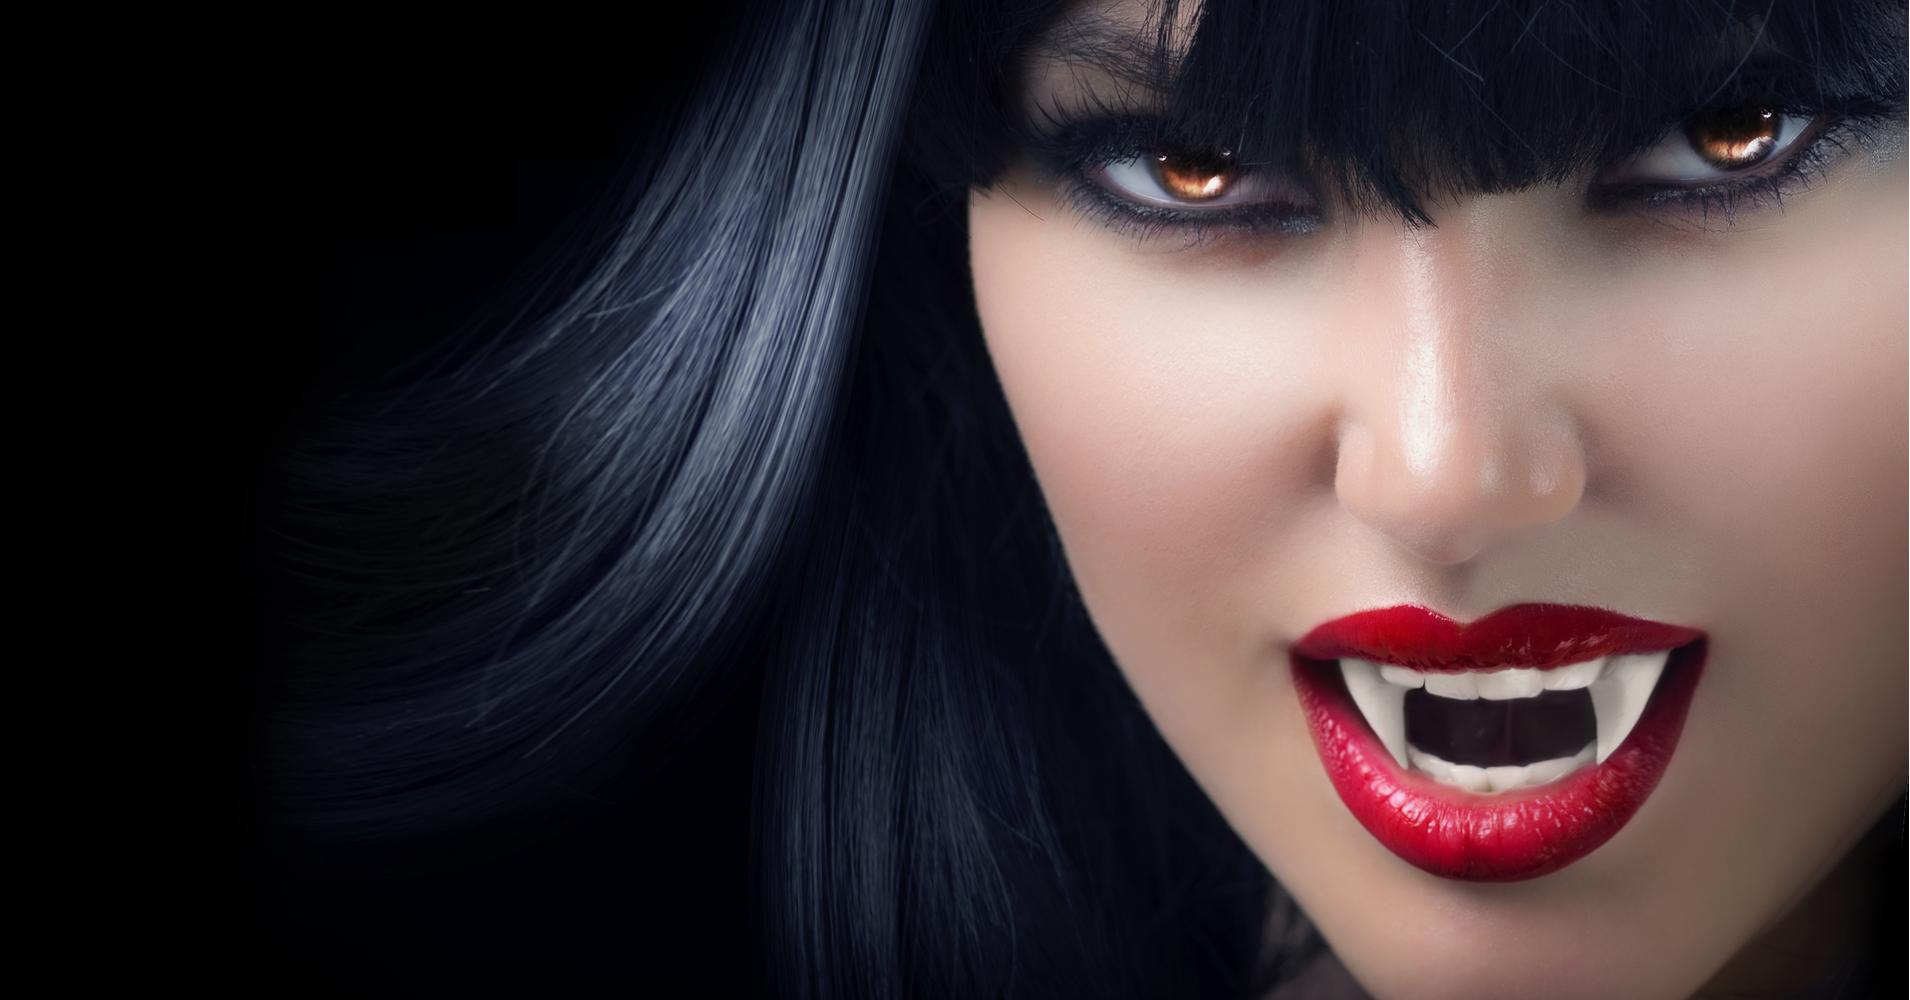 Bbw vampire